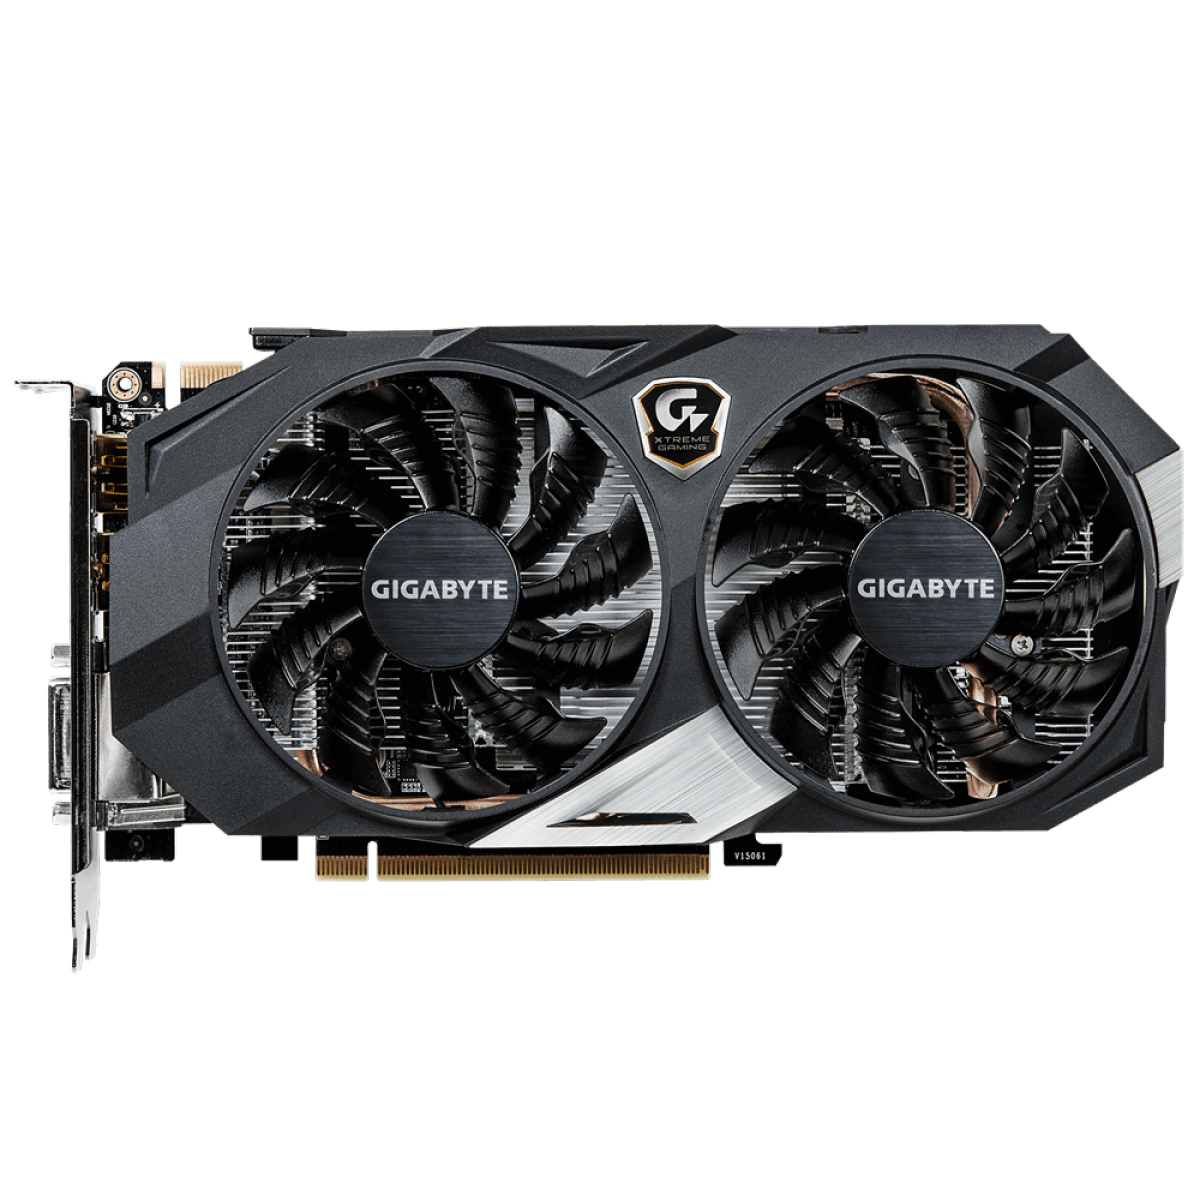 Placa de Vídeo Gigabyte GeForce GTX 950 XTreme, 2GB, GDDR5, 128bit, GV-N950XTREME-2GD